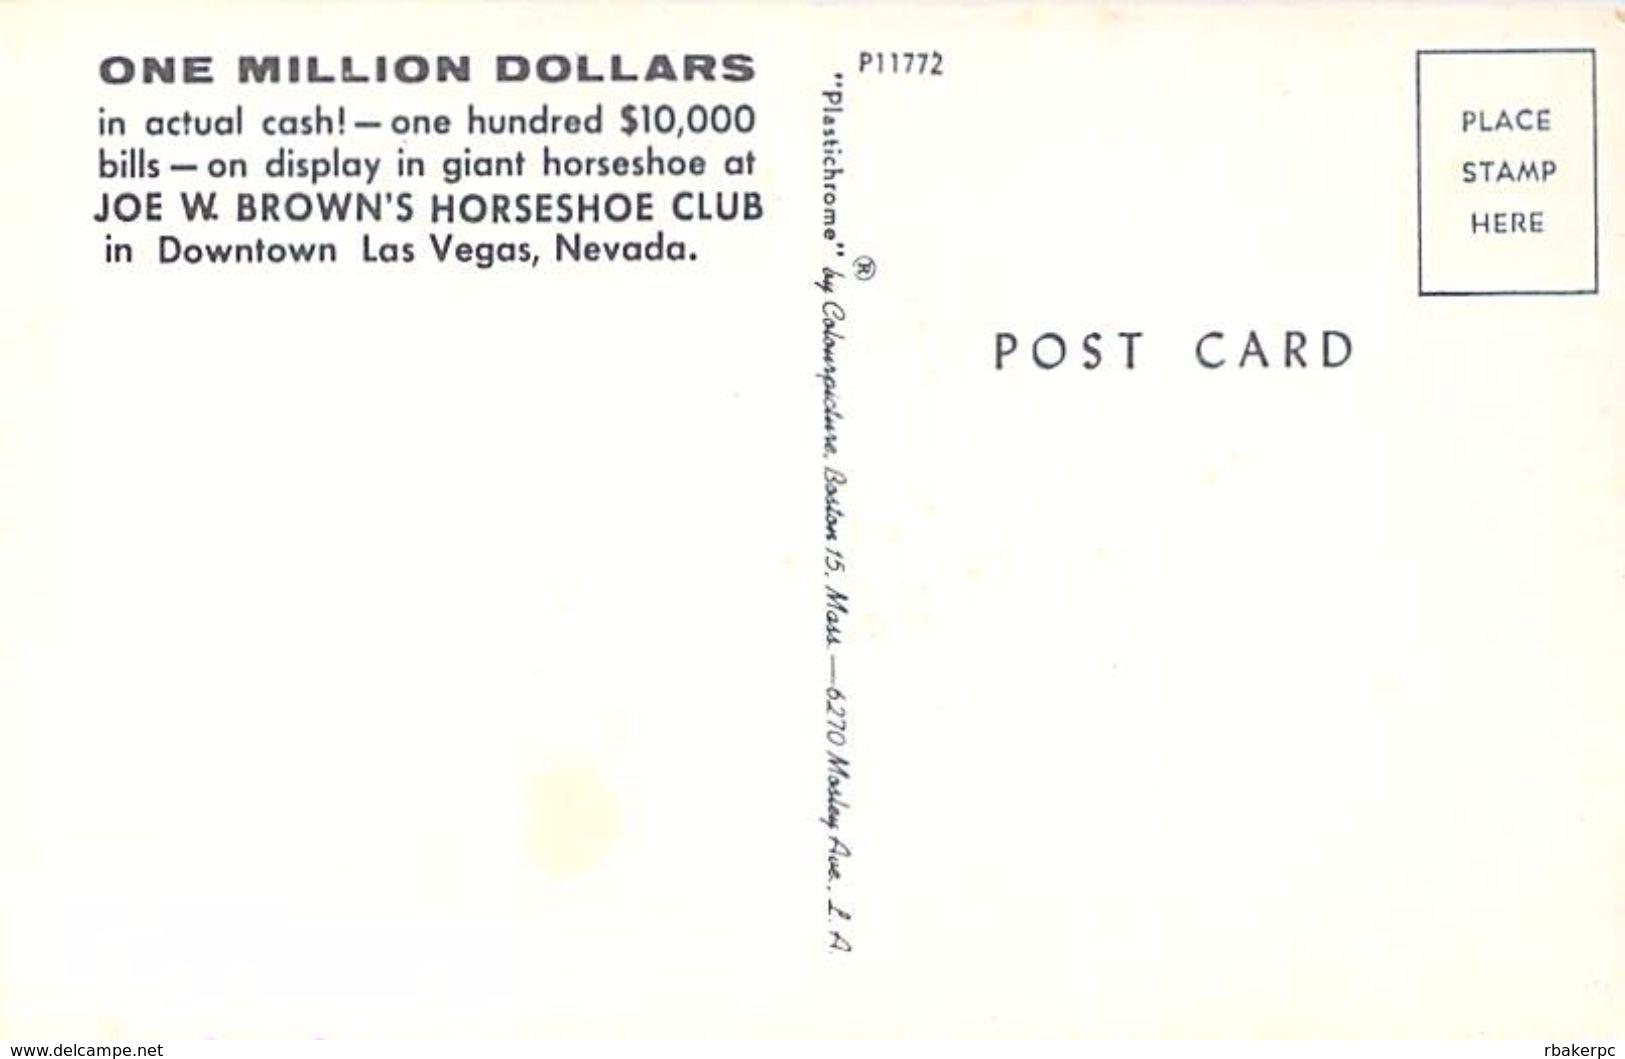 Joe W. Brown's Horseshoe Club - Las Vegas, NV - Las Vegas